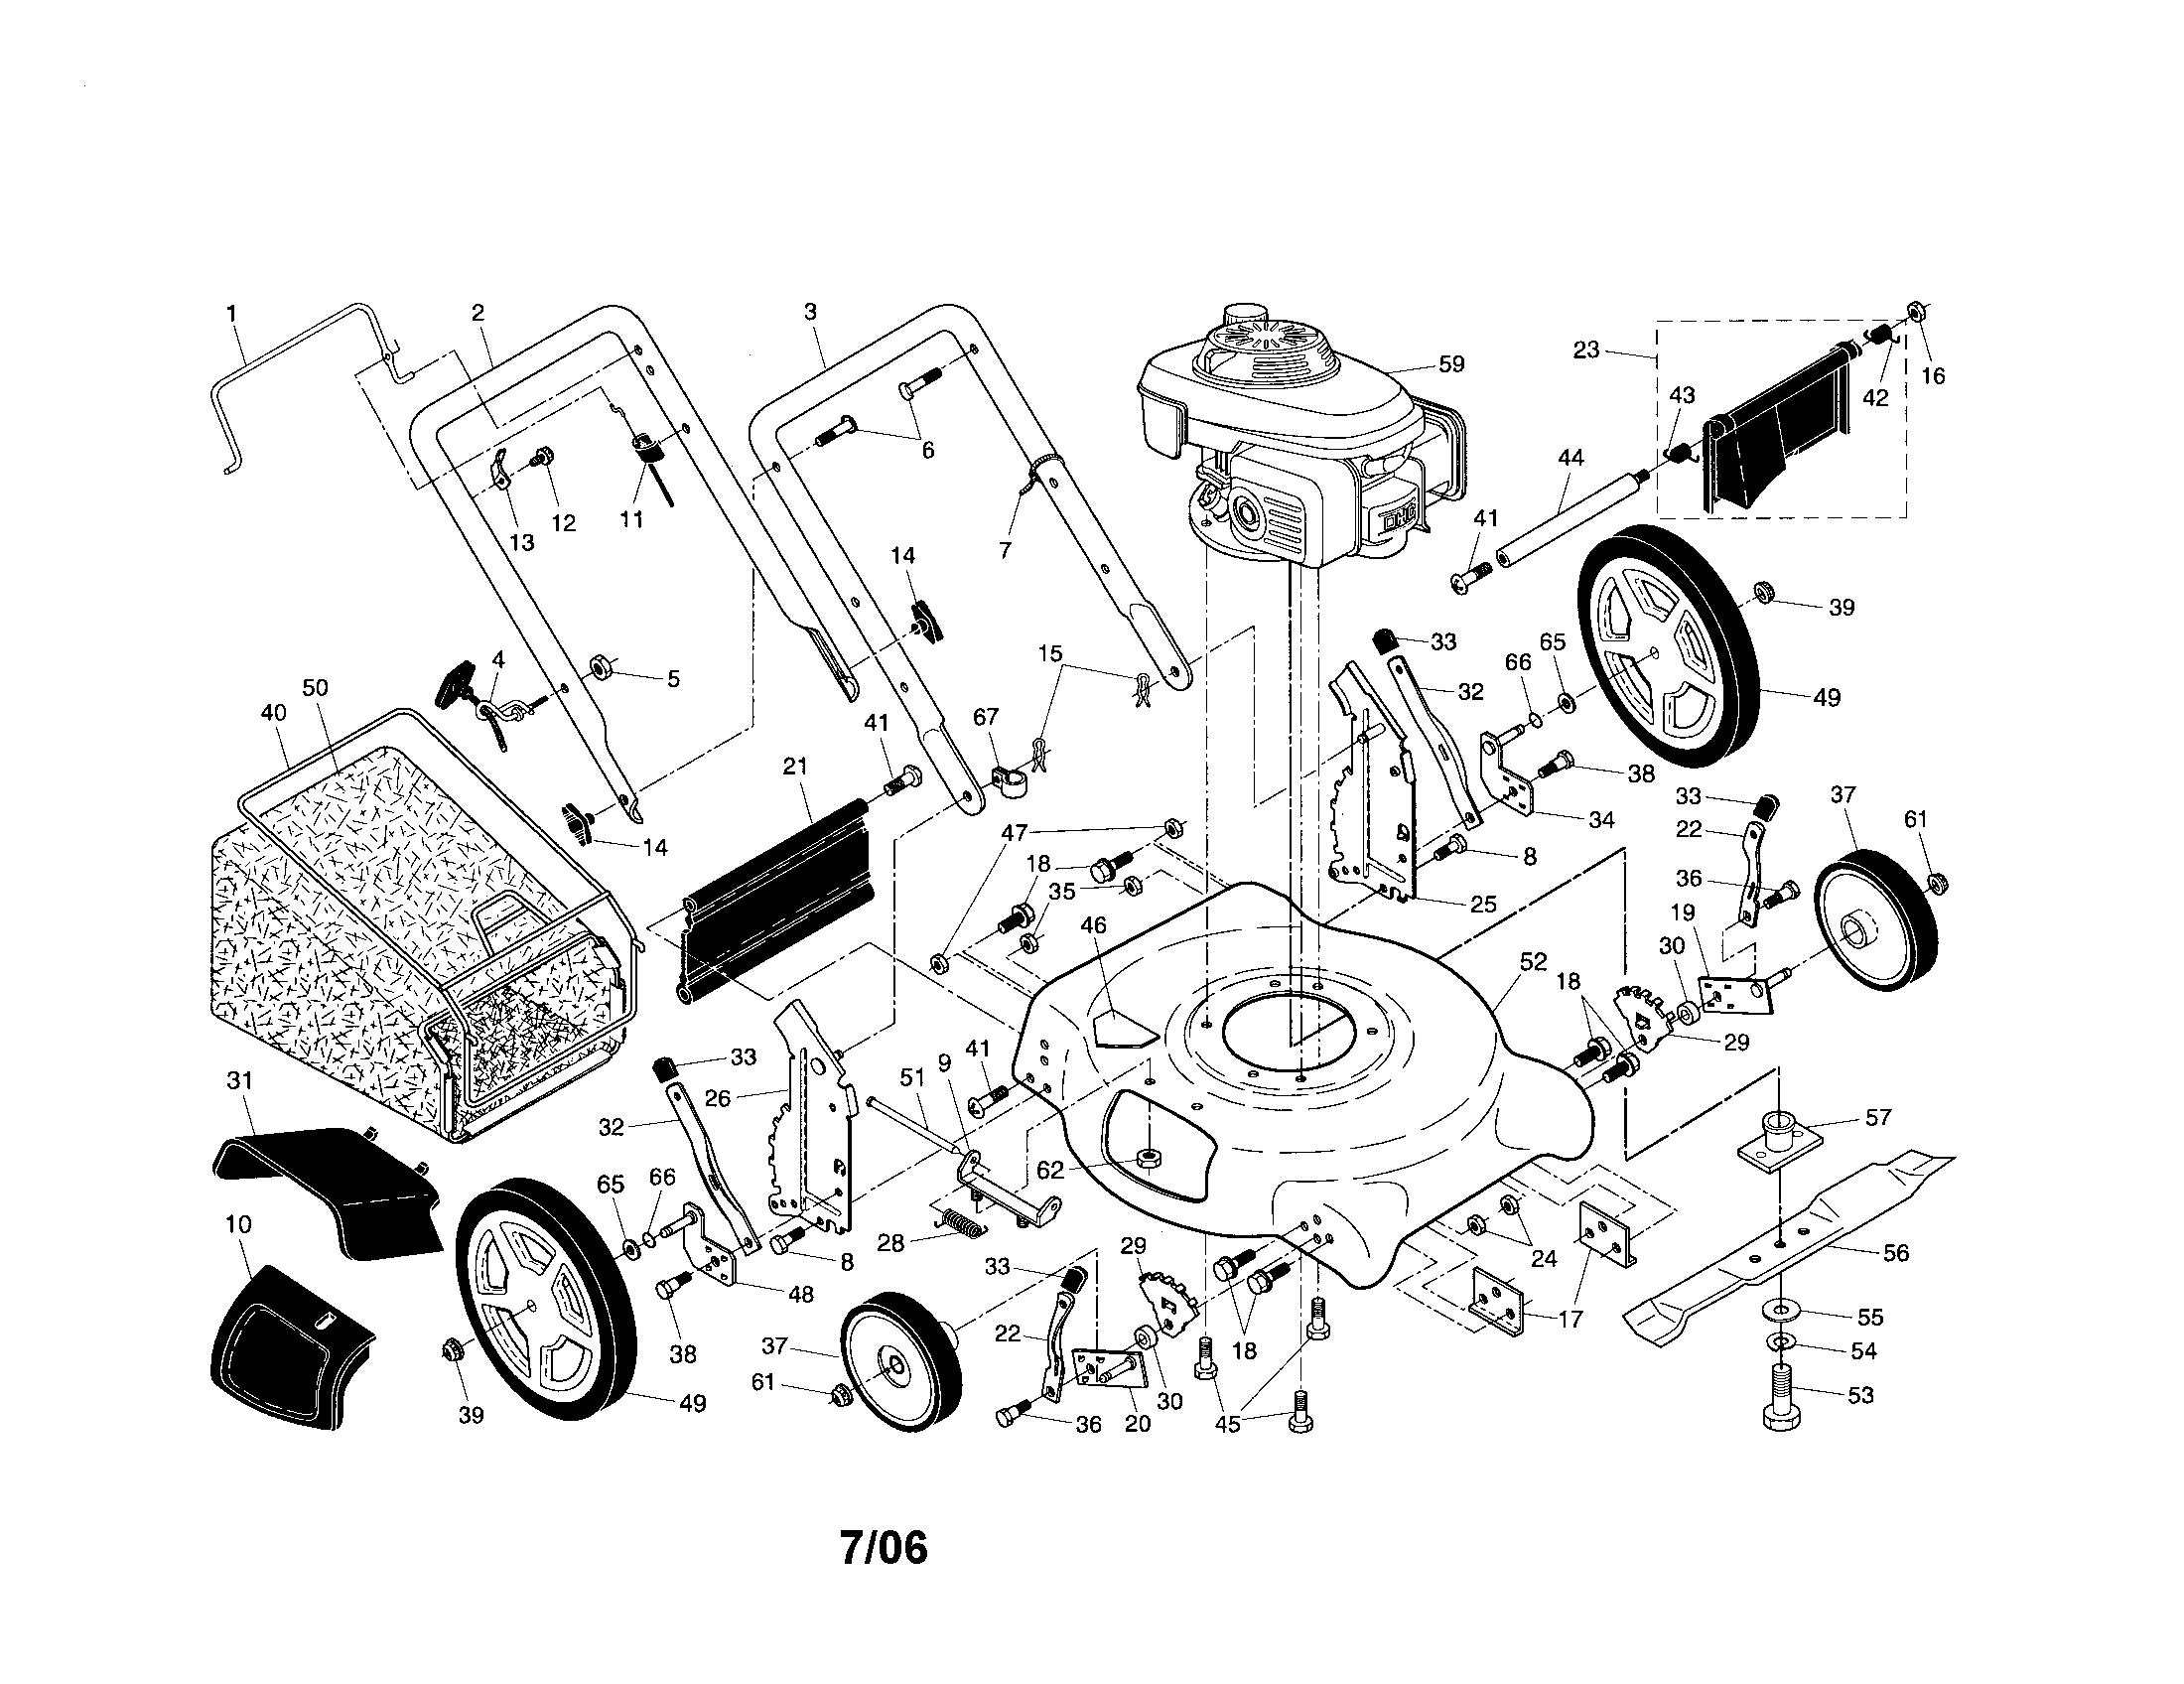 Honda Gcv190 Parts. Honda Mower Hrr216vka Diagram Honda